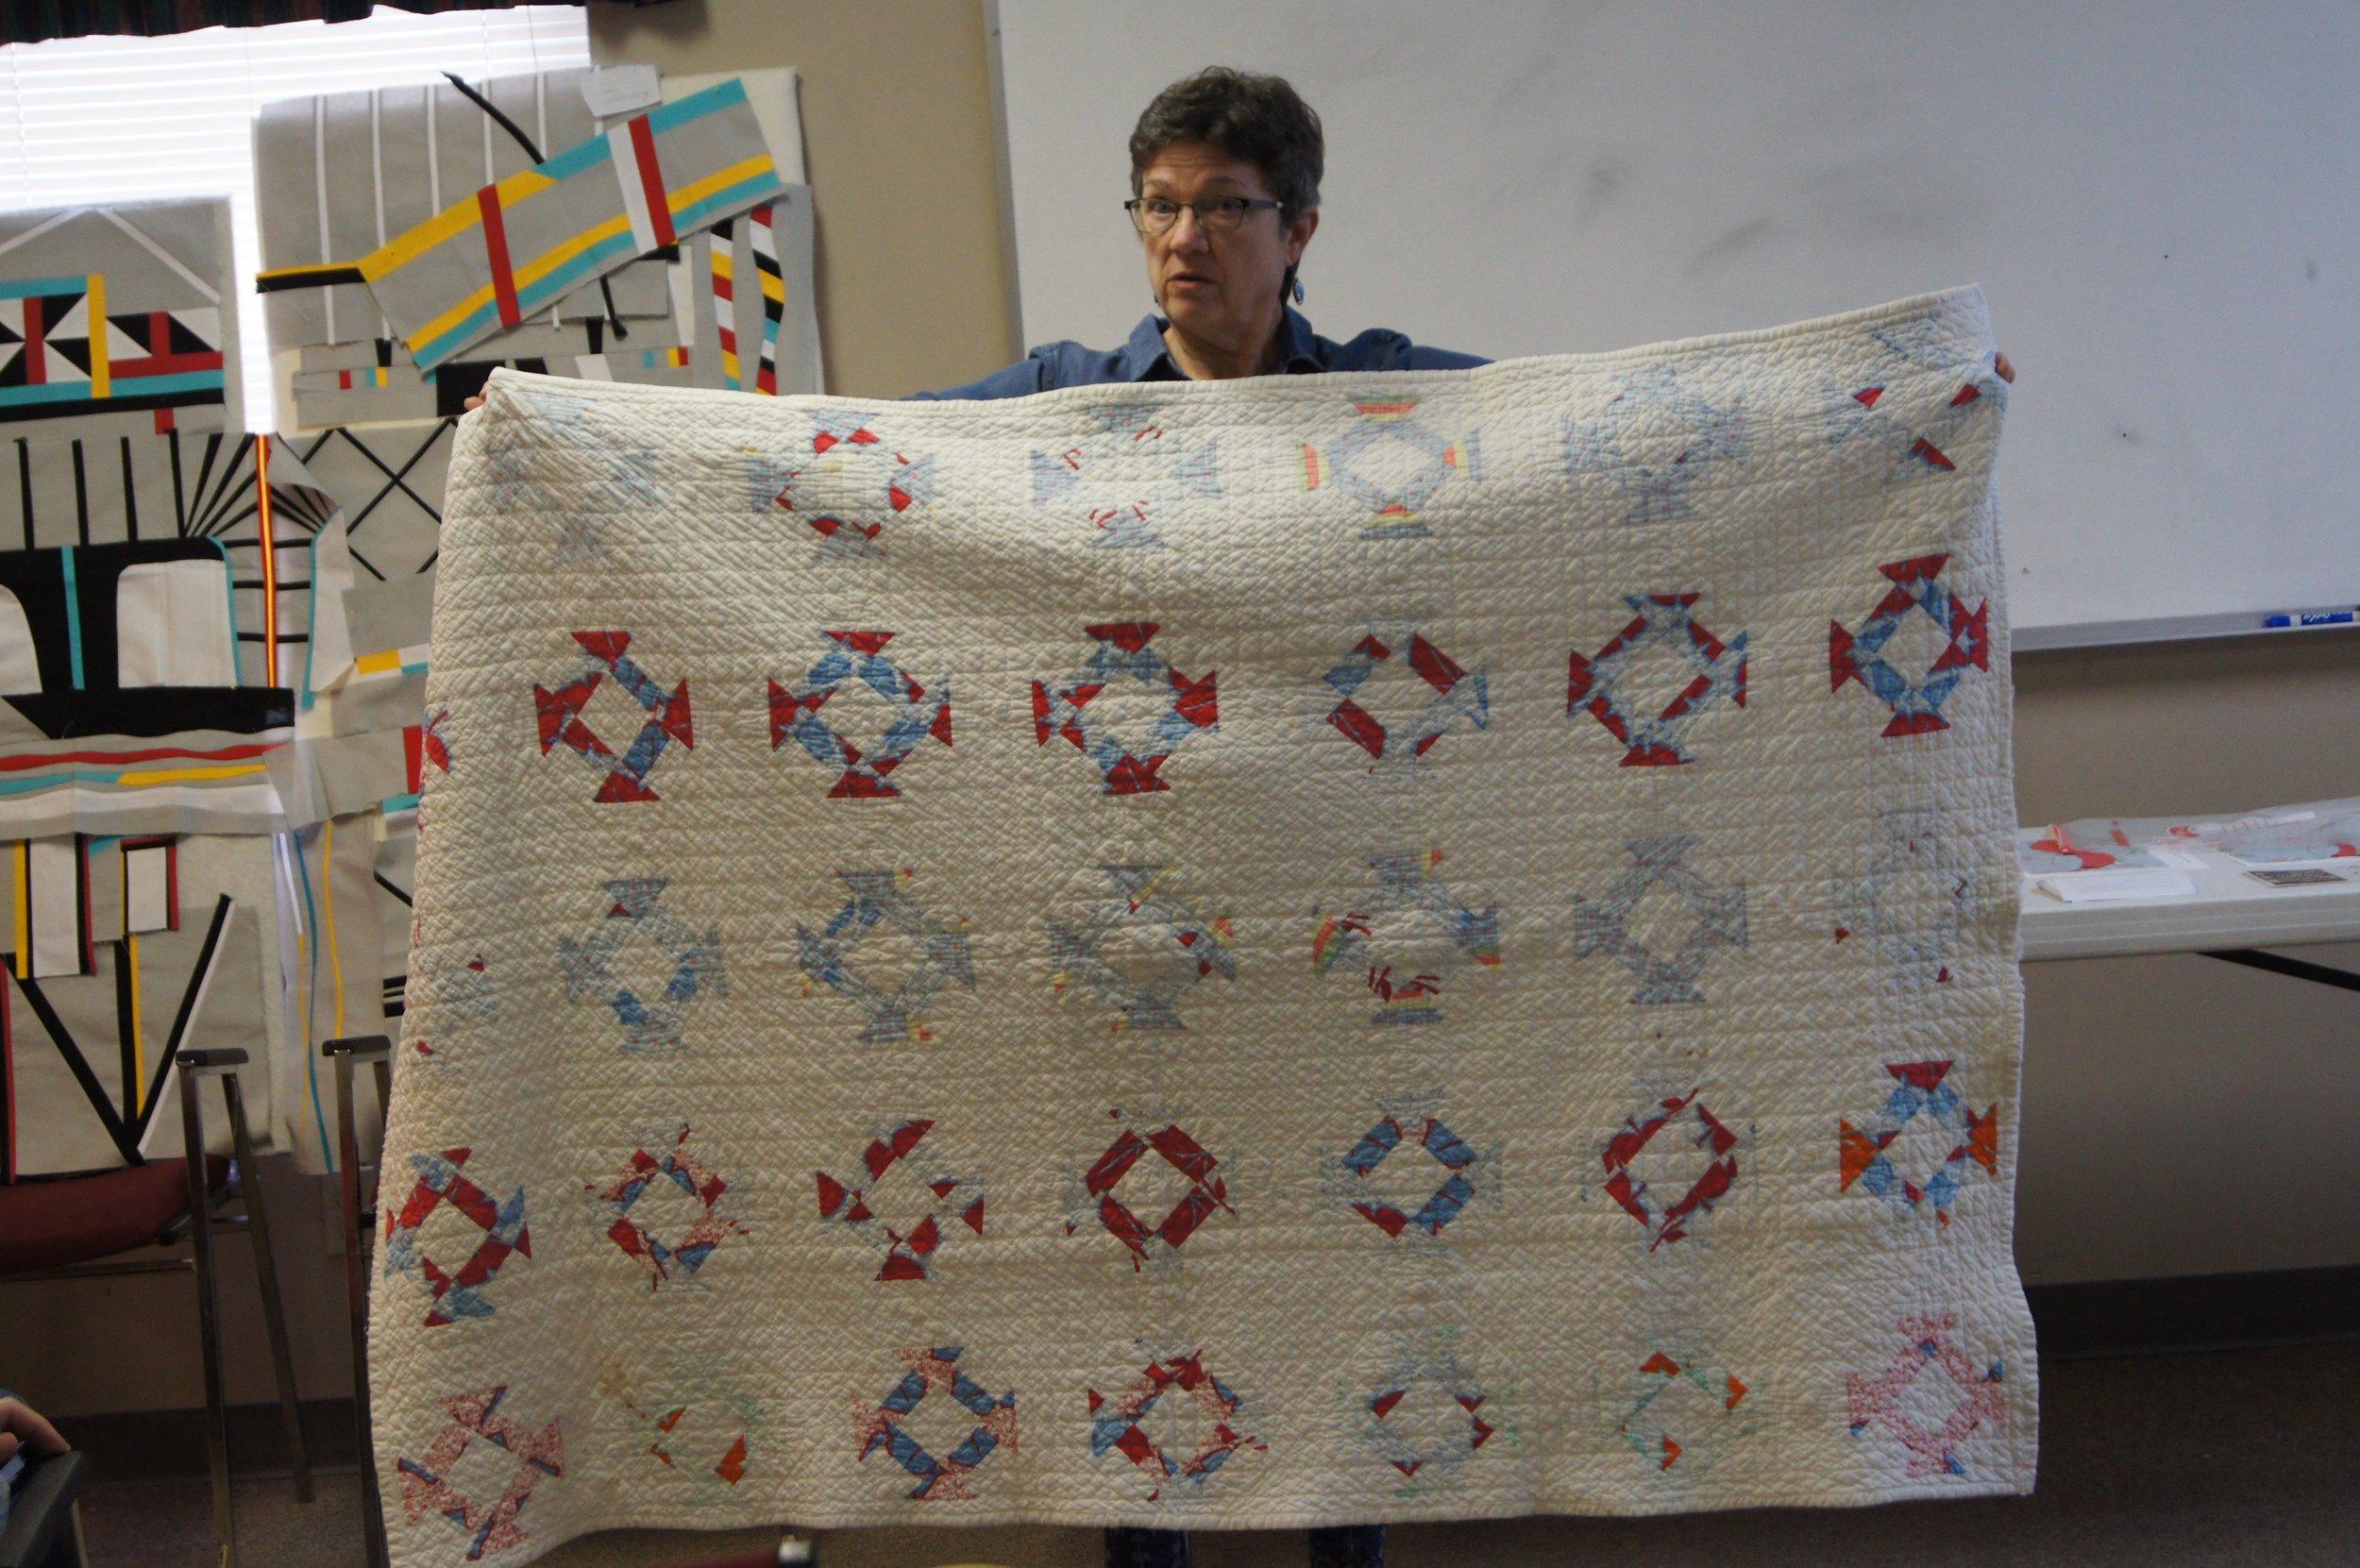 Mary Keasler's antique quilt